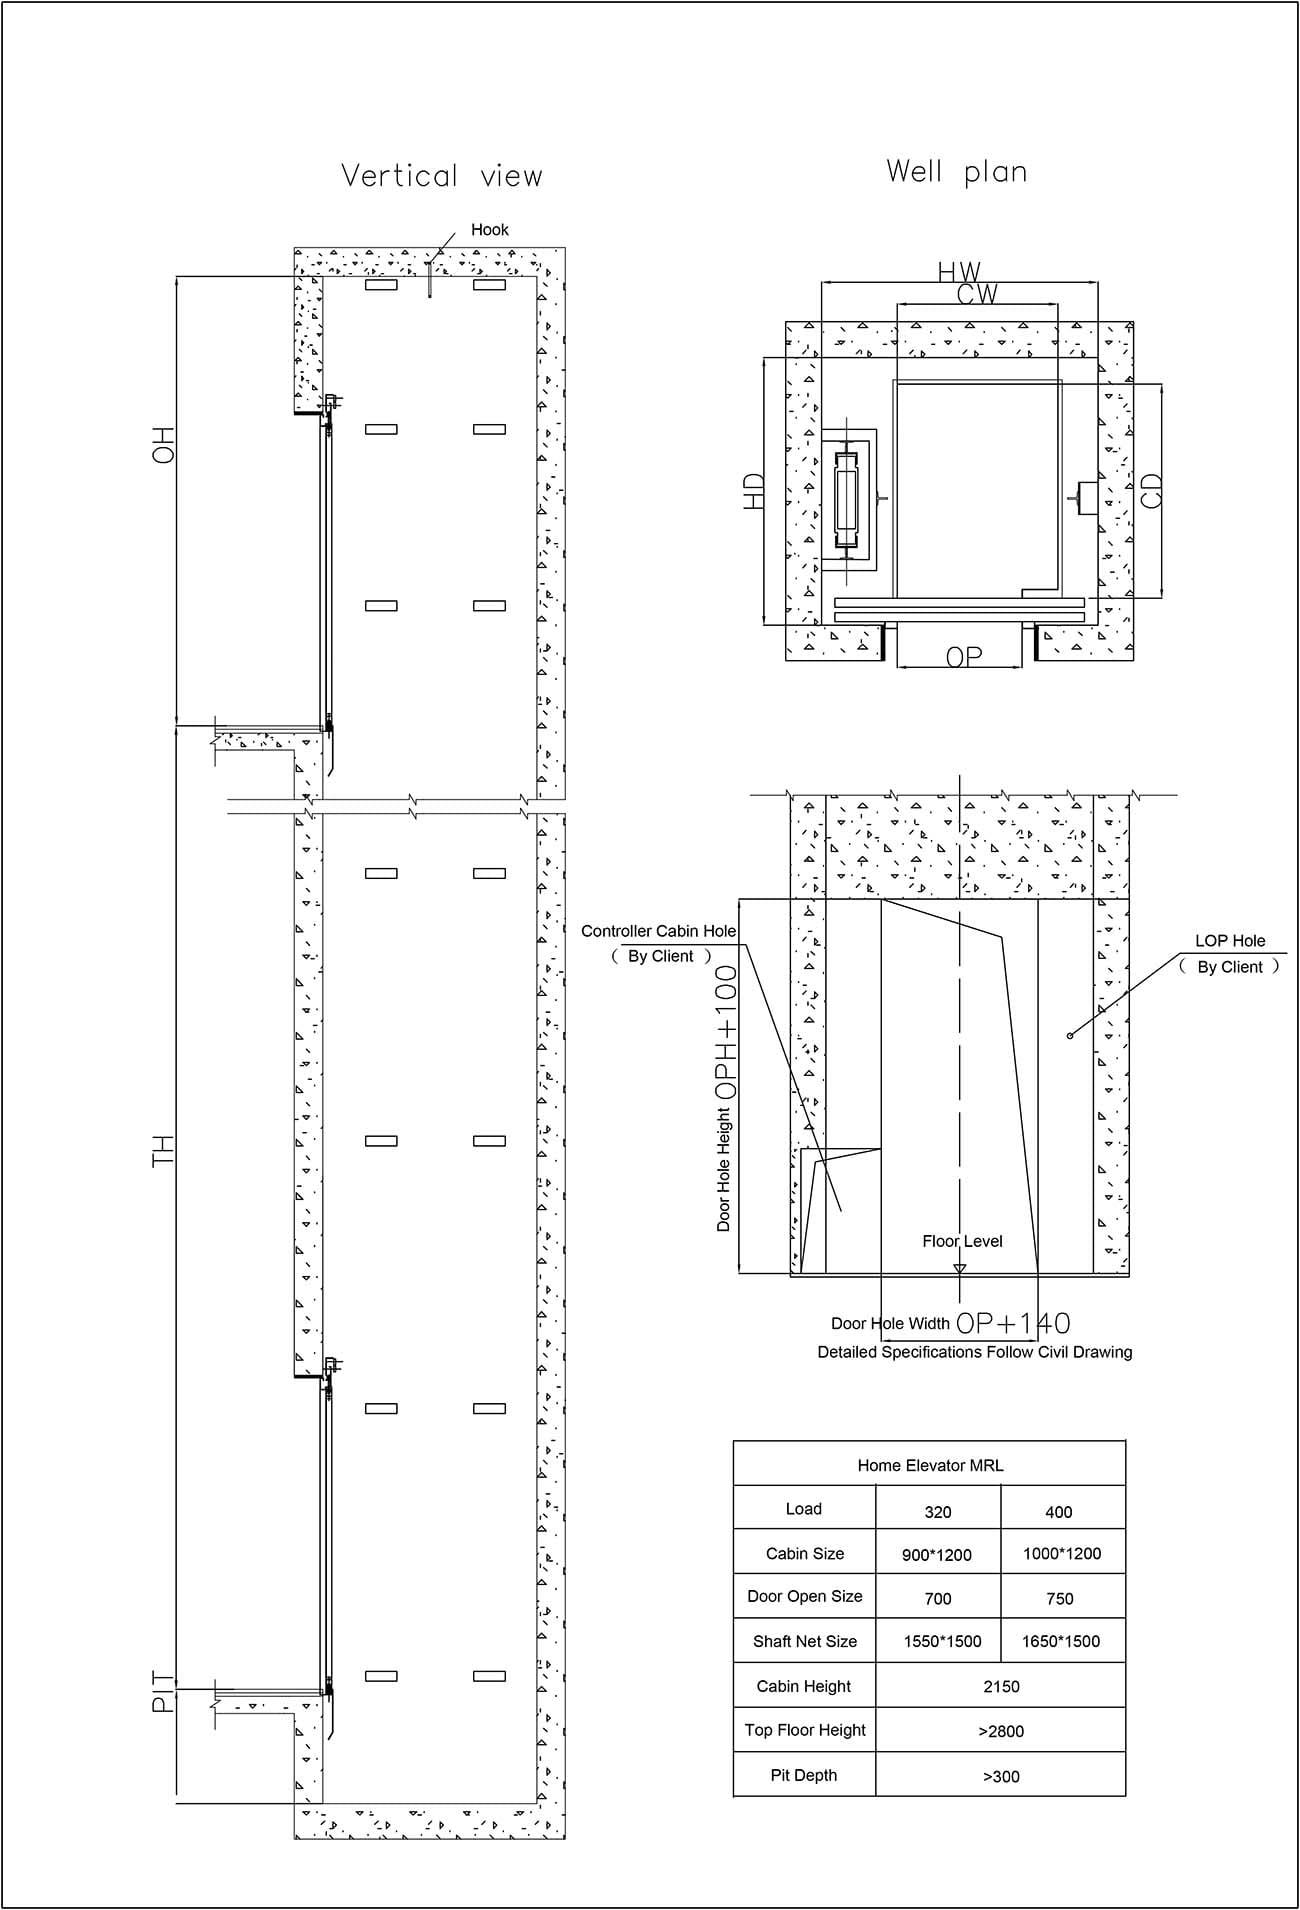 C:UsersLiHanningDesktopTMJ标准图 Model (1)